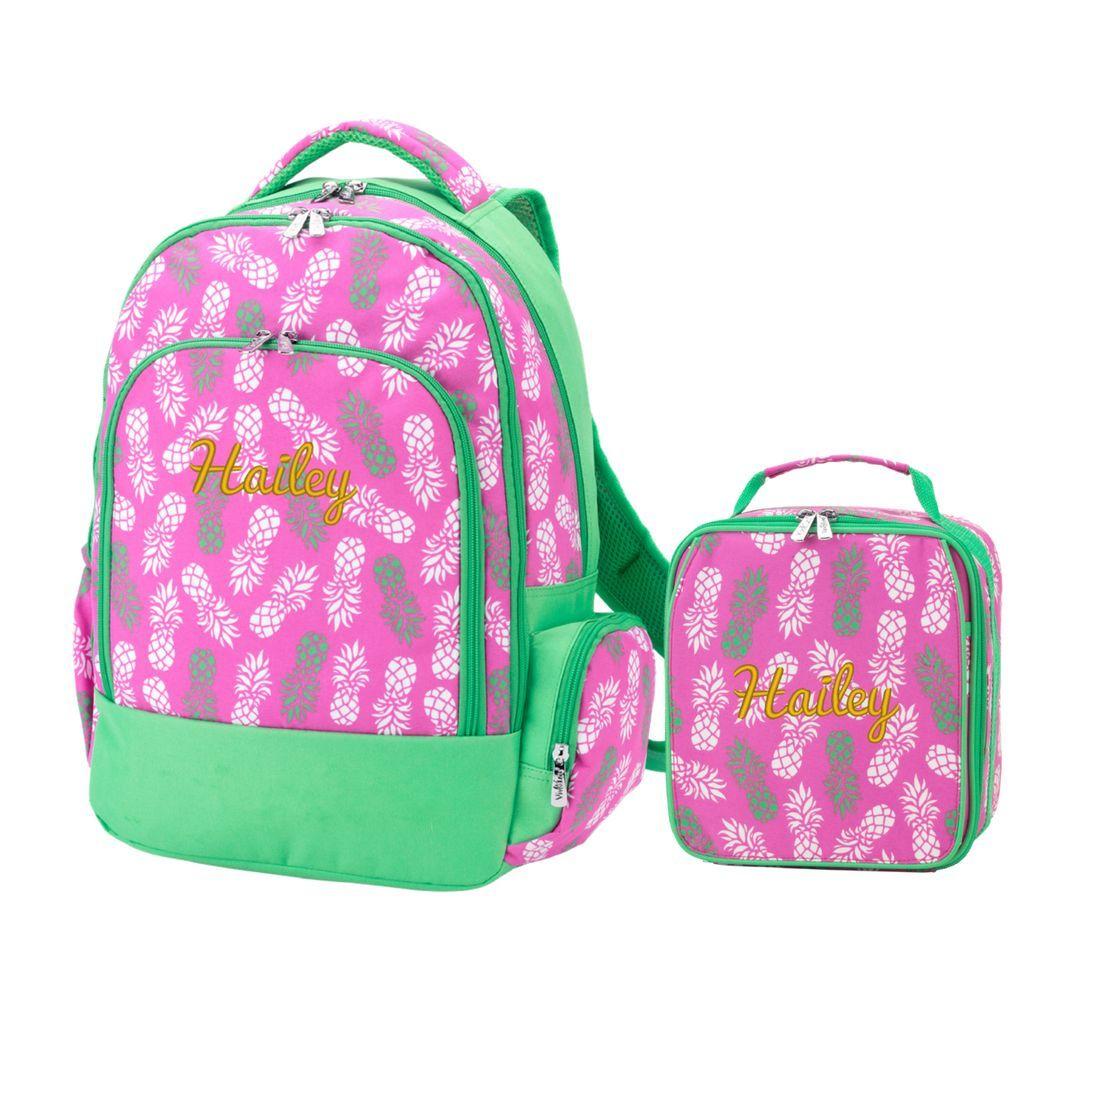 943f9bda02bc Monogram Backpack · Teen Kids · Send her back to school in style! Personalized  Backpacks